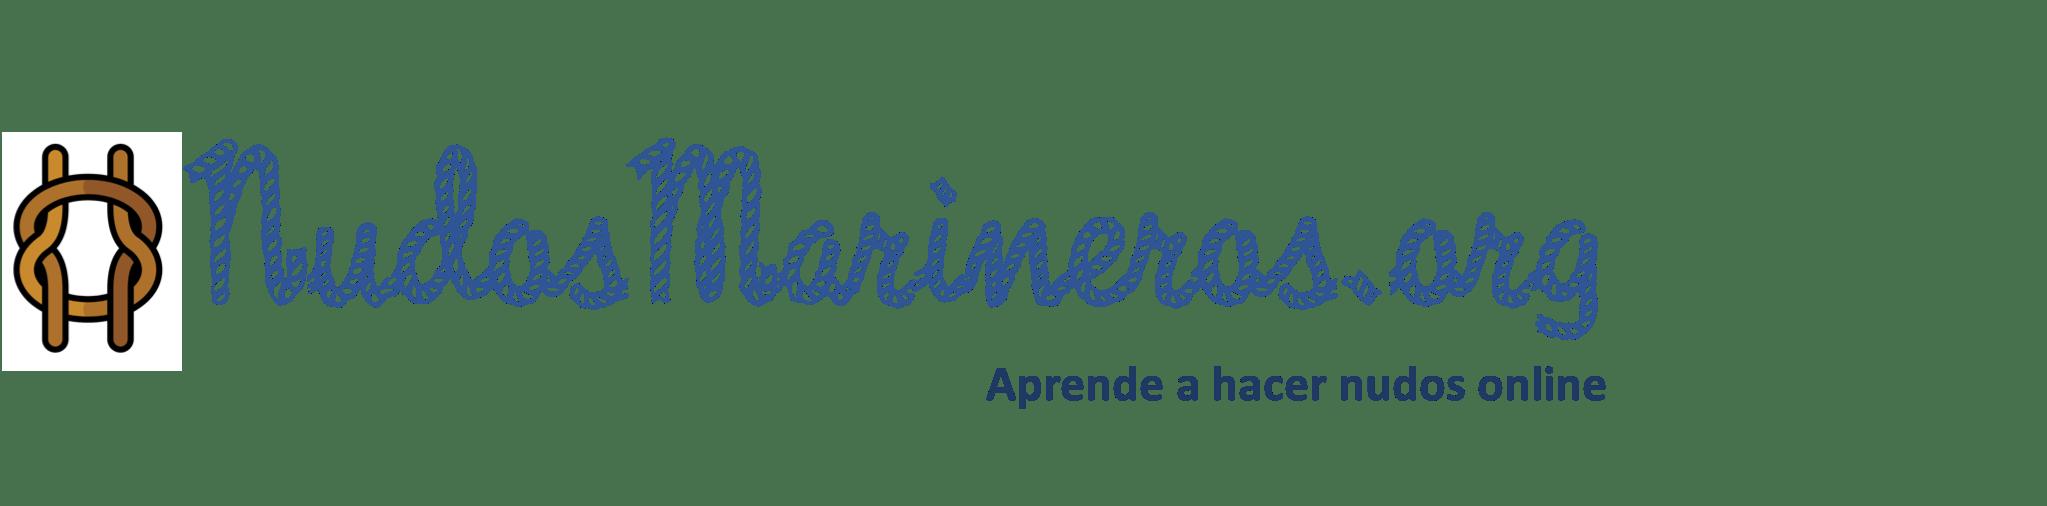 NudosMarineros.org